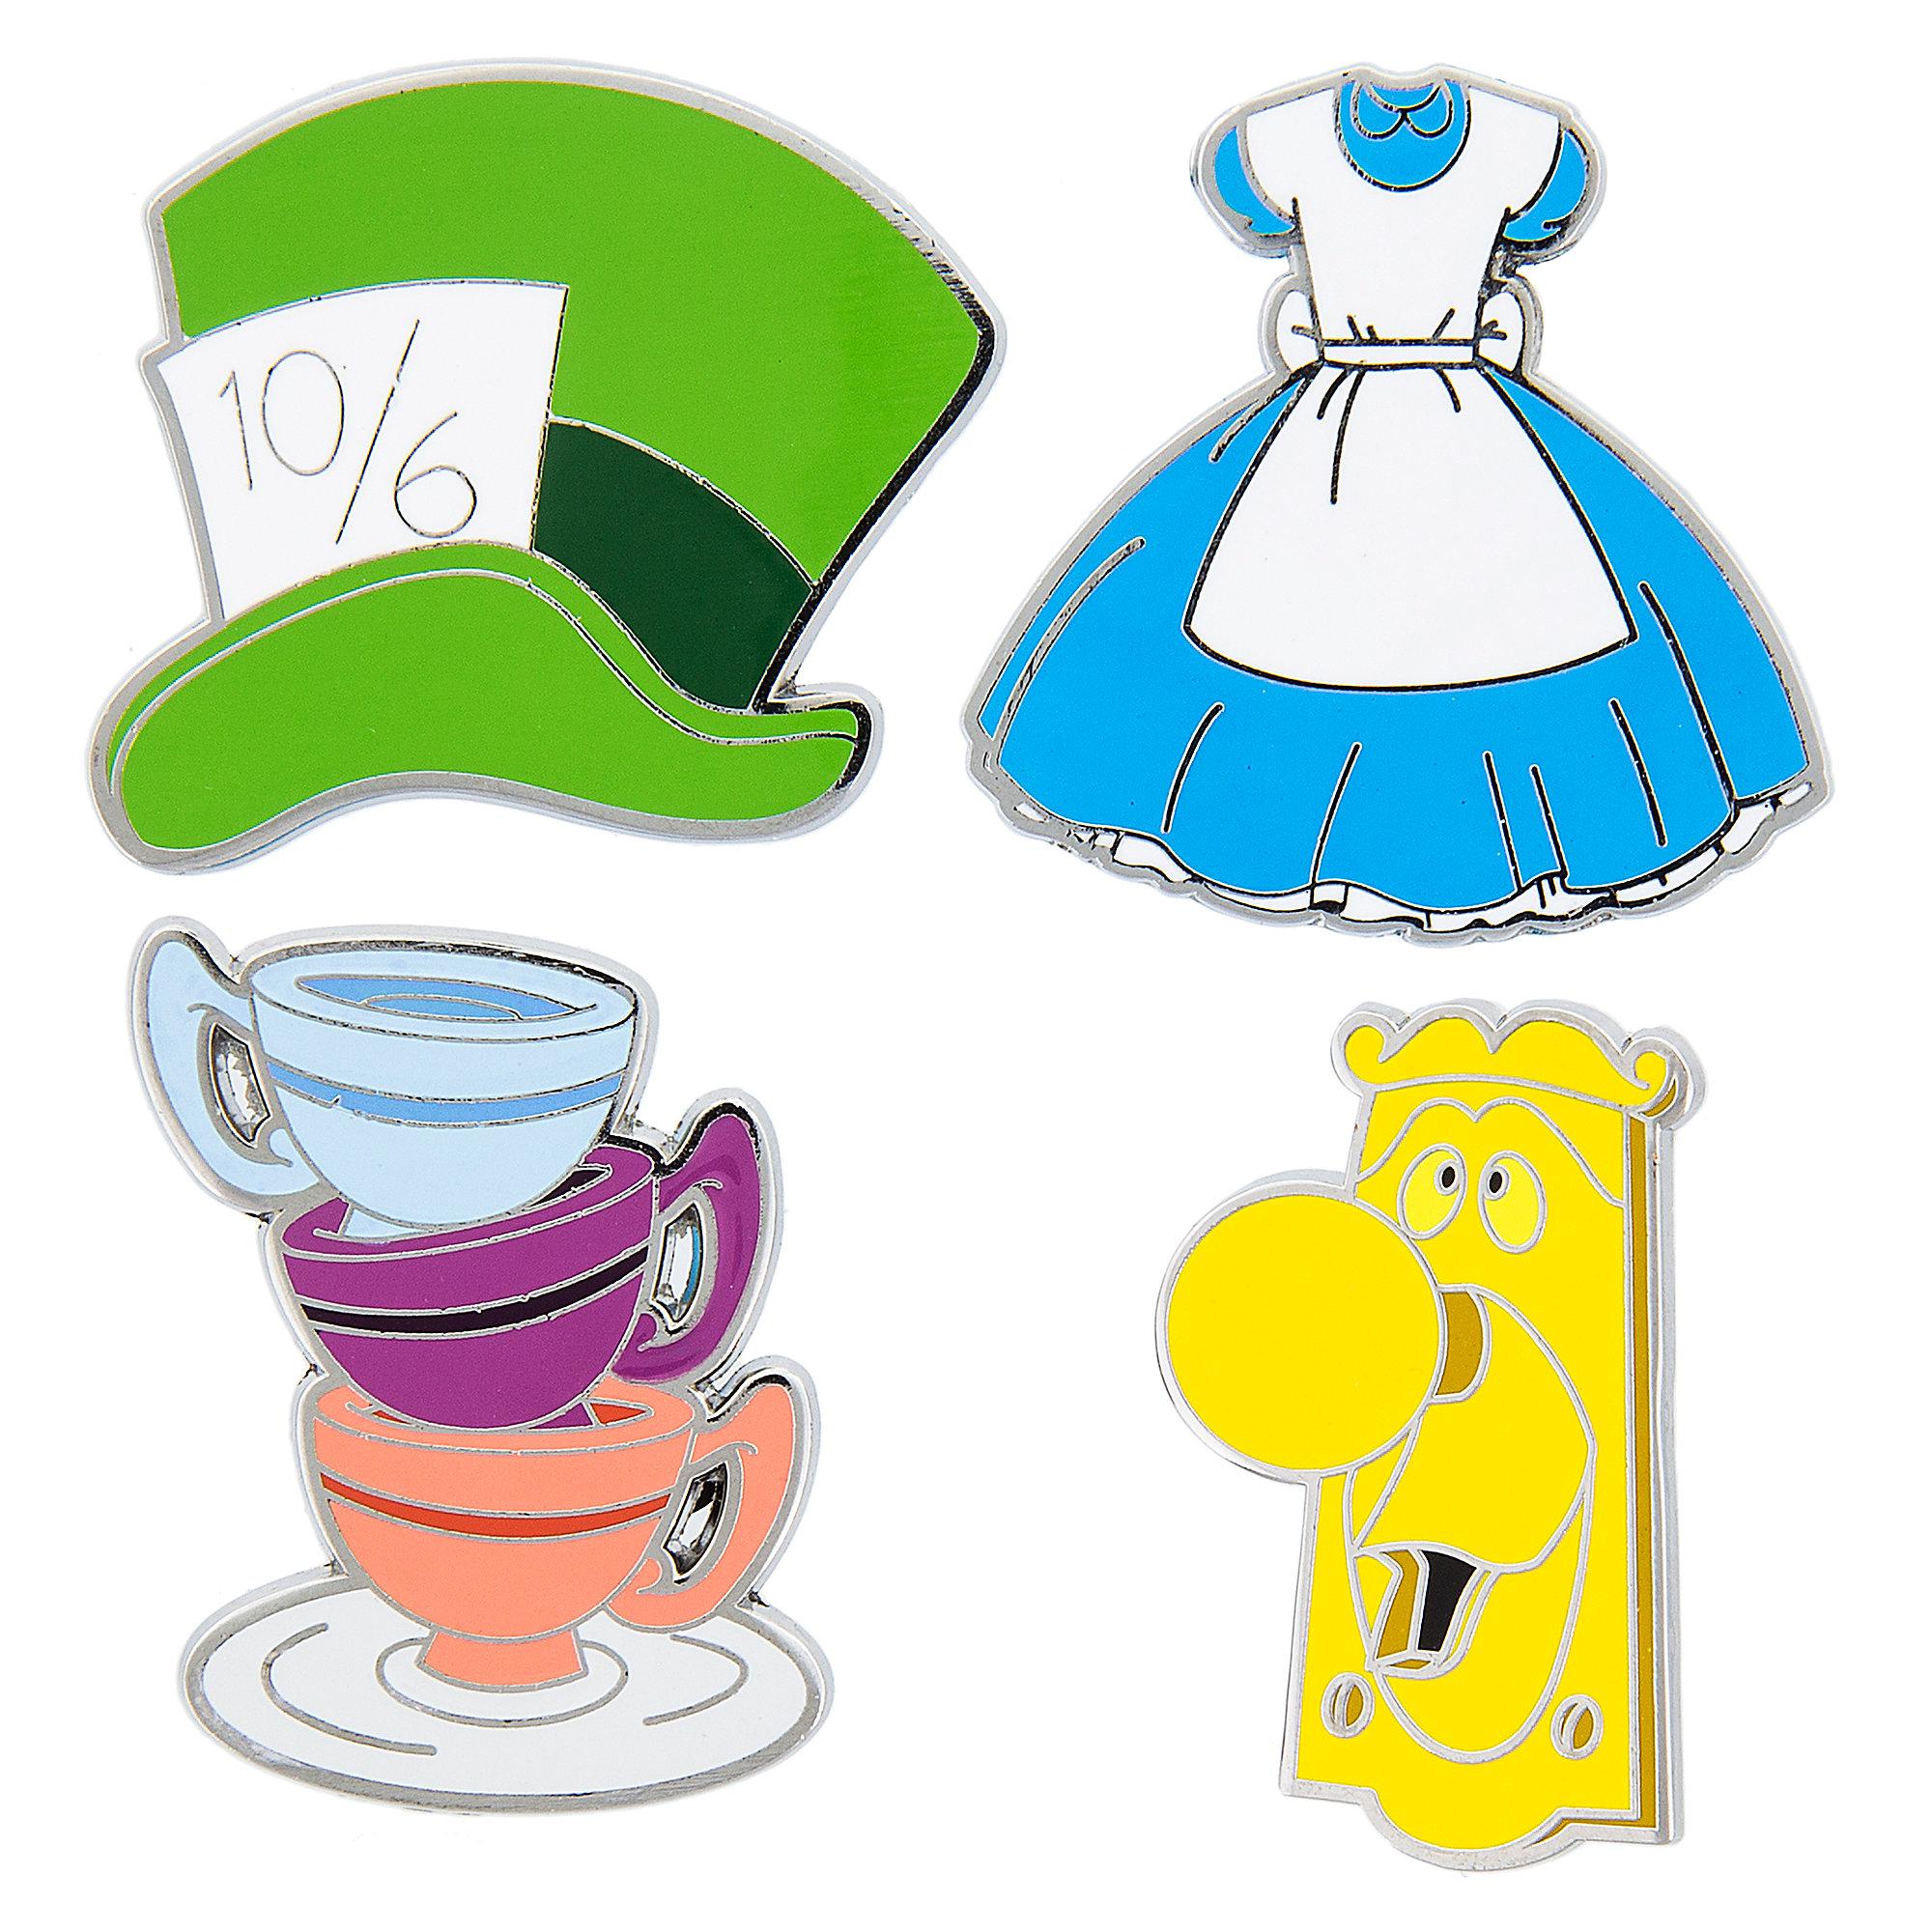 2000x2000 Alice In Wonderland Pin Trading Flair Set Shopdisney